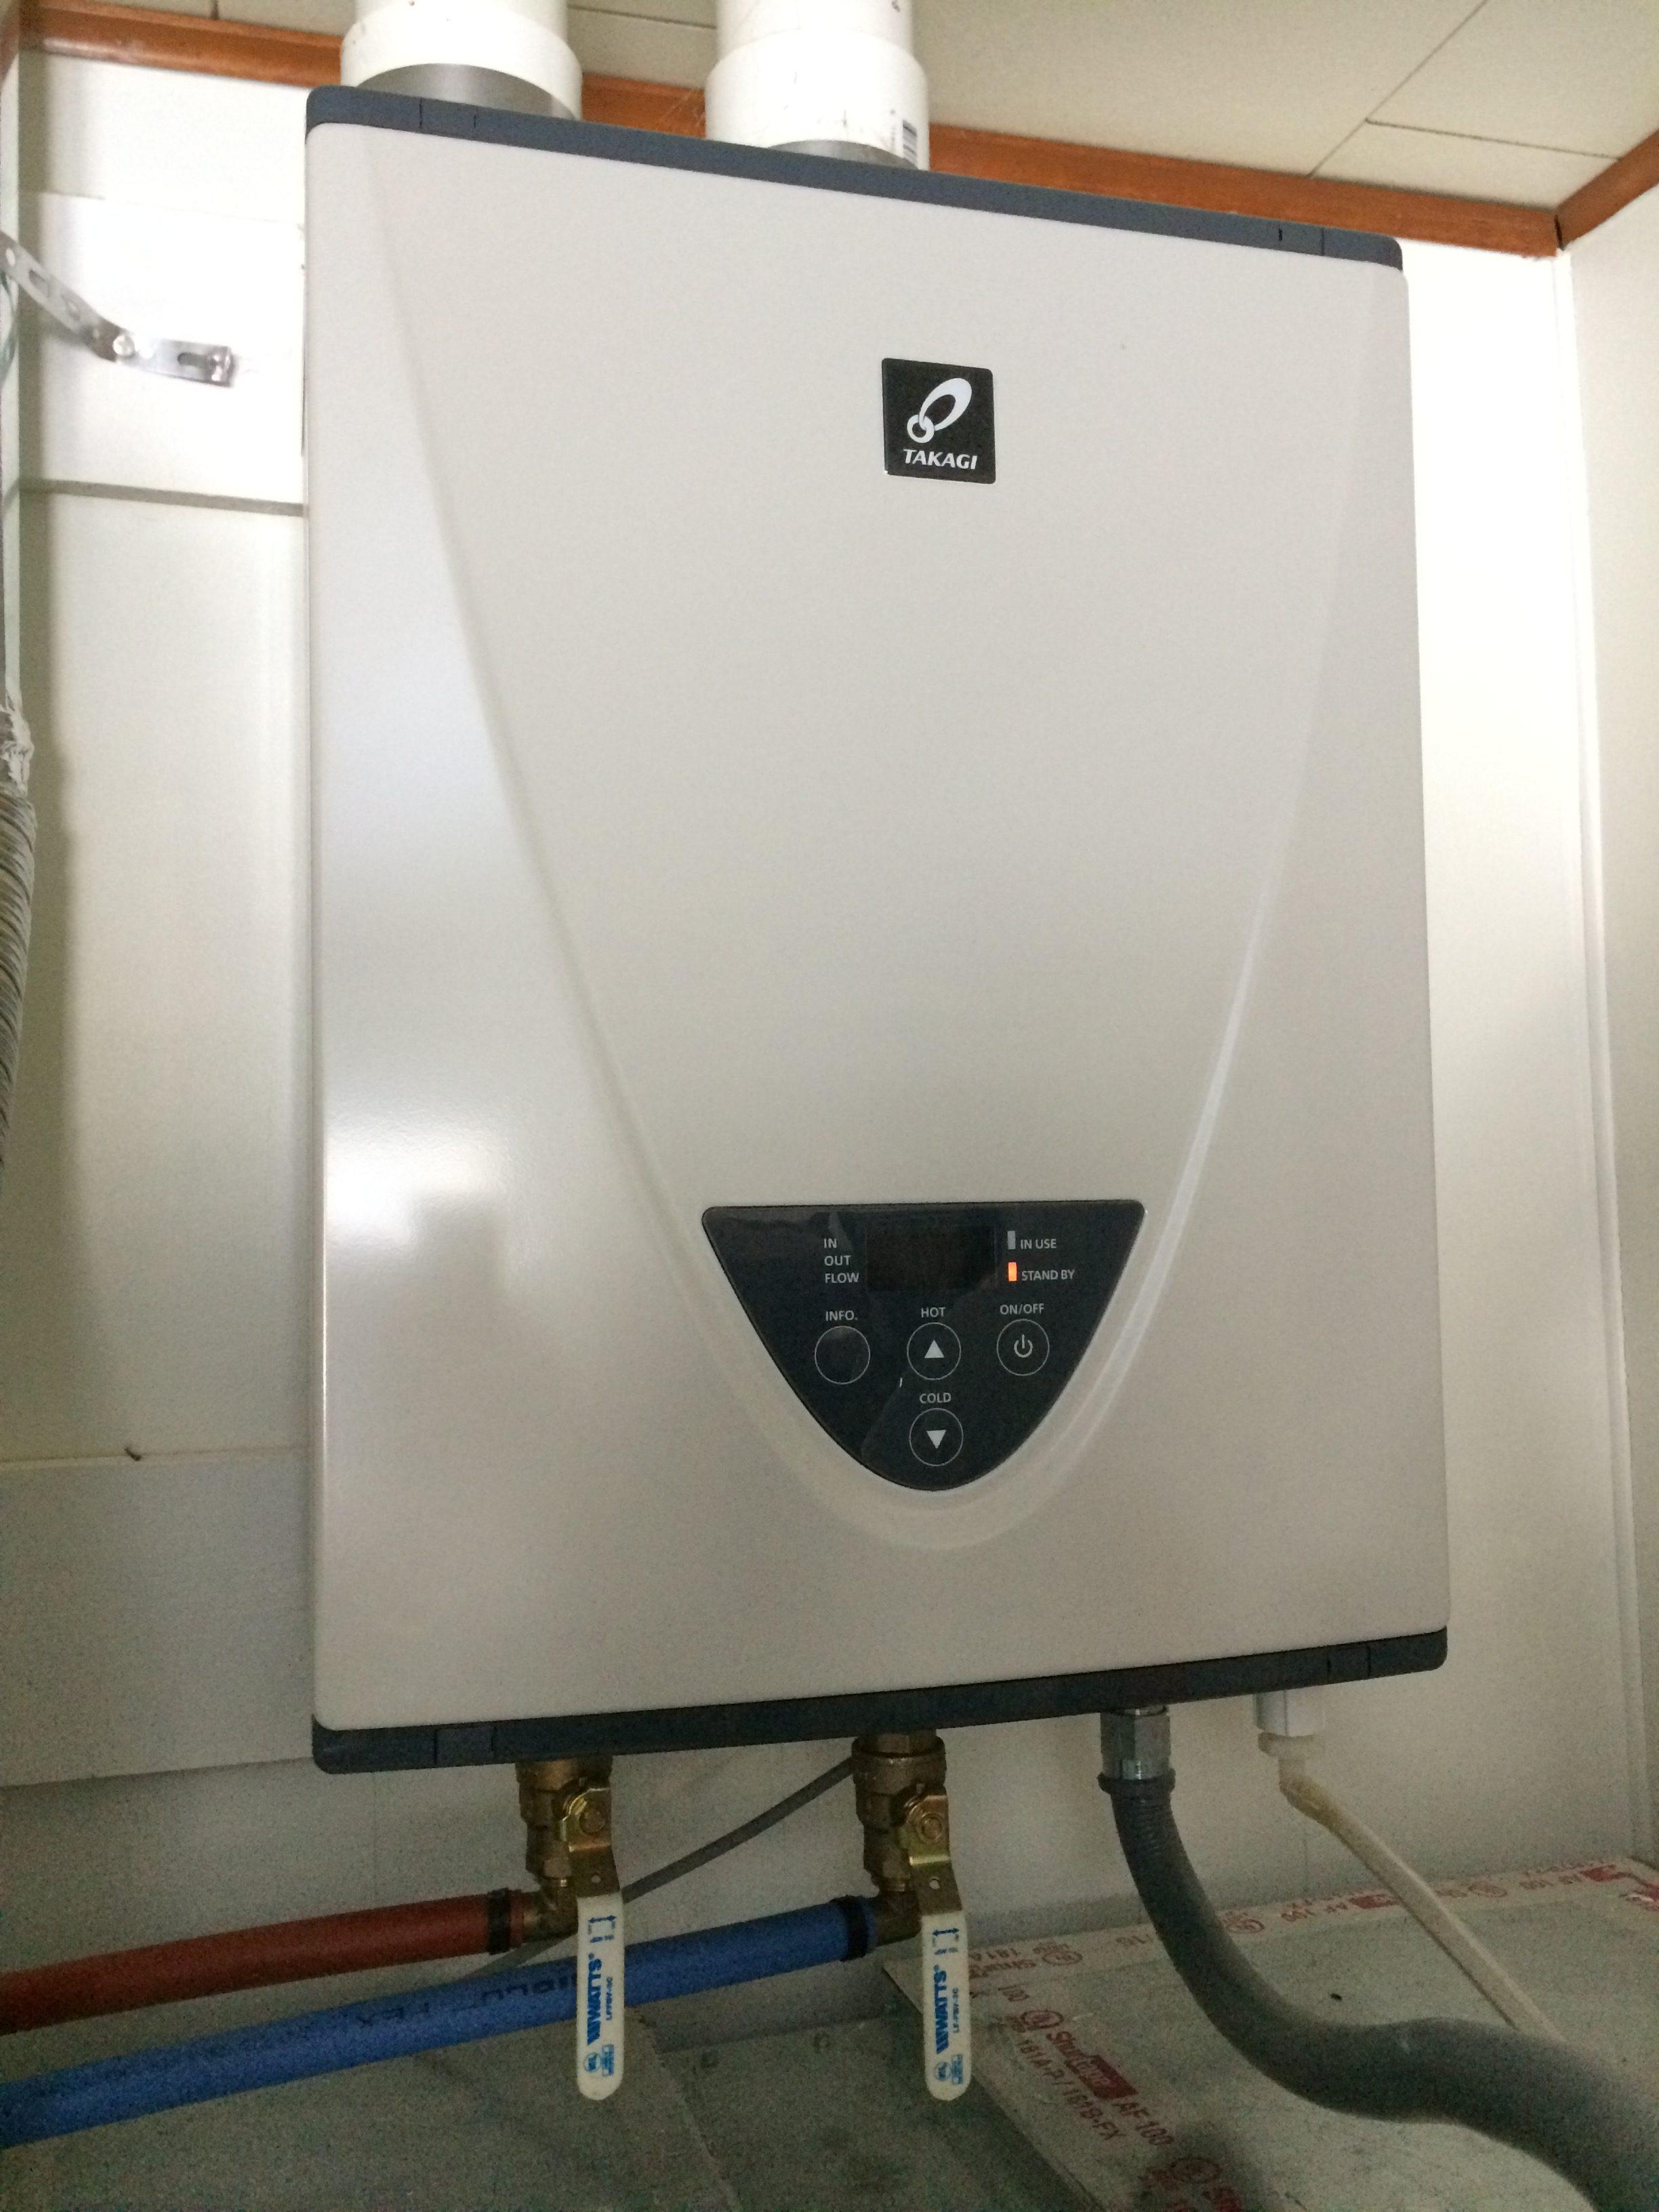 Takagi T-H3S-DV-P On Demand Tankless Water Heater